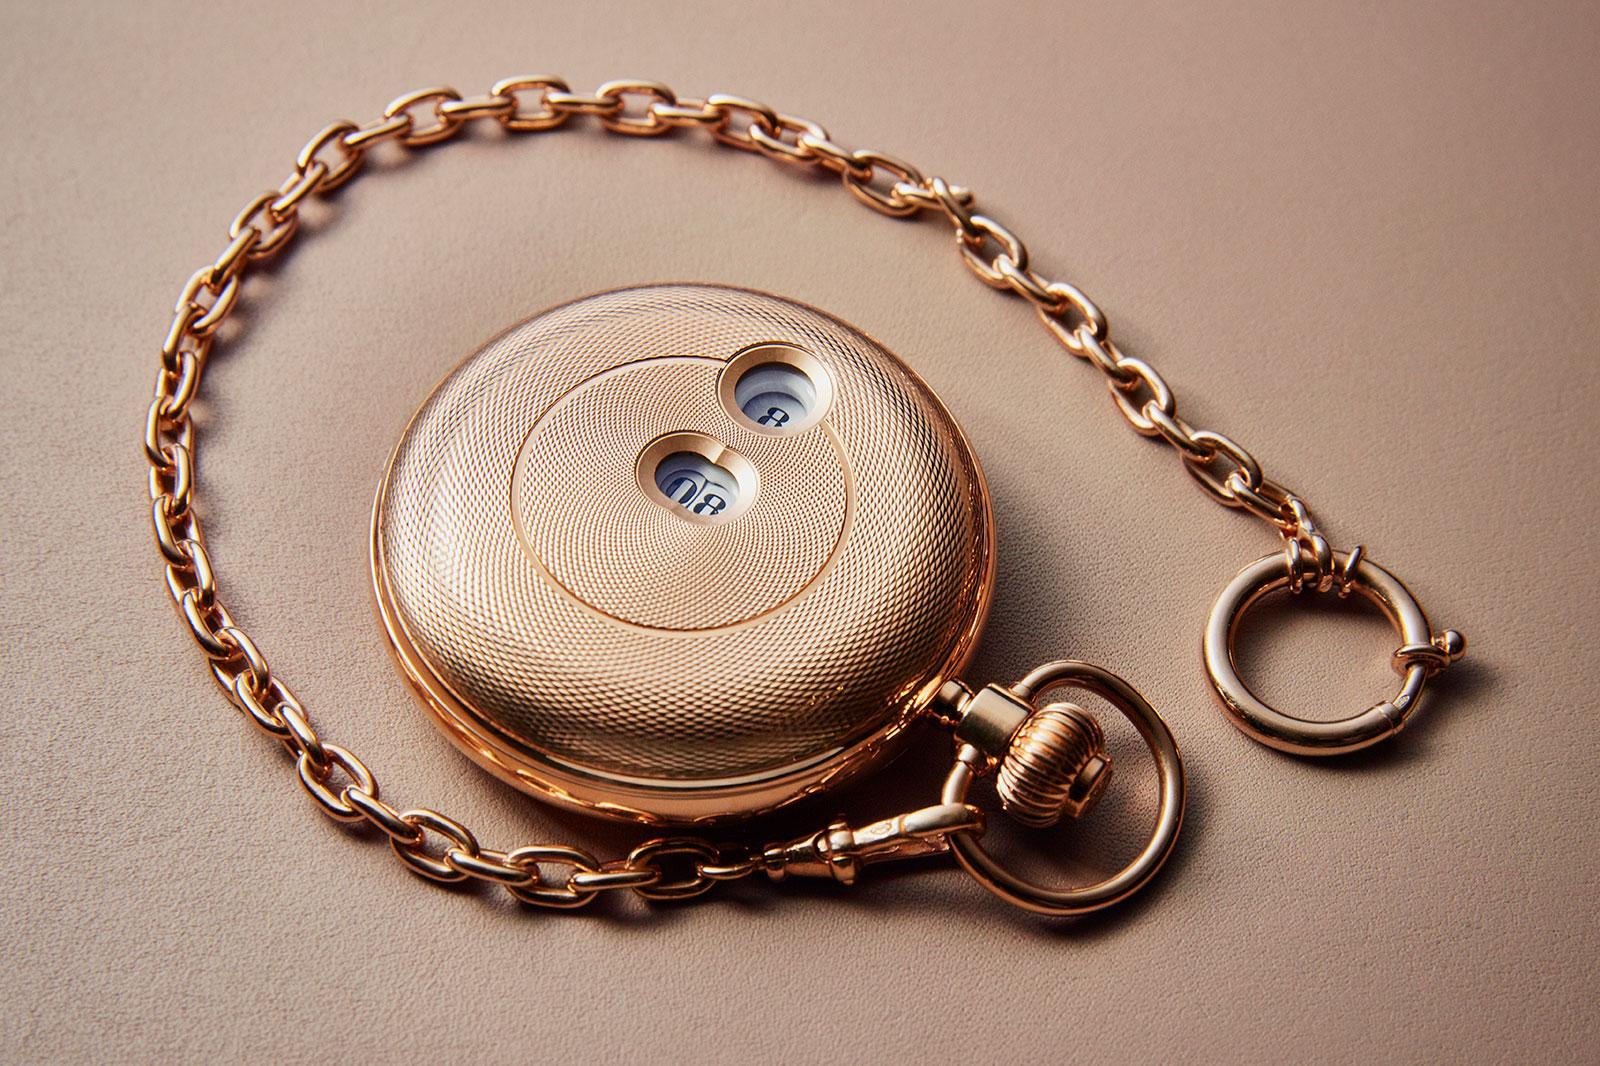 IWC Pallweber 150 Years Pocket Watch limited edition 3